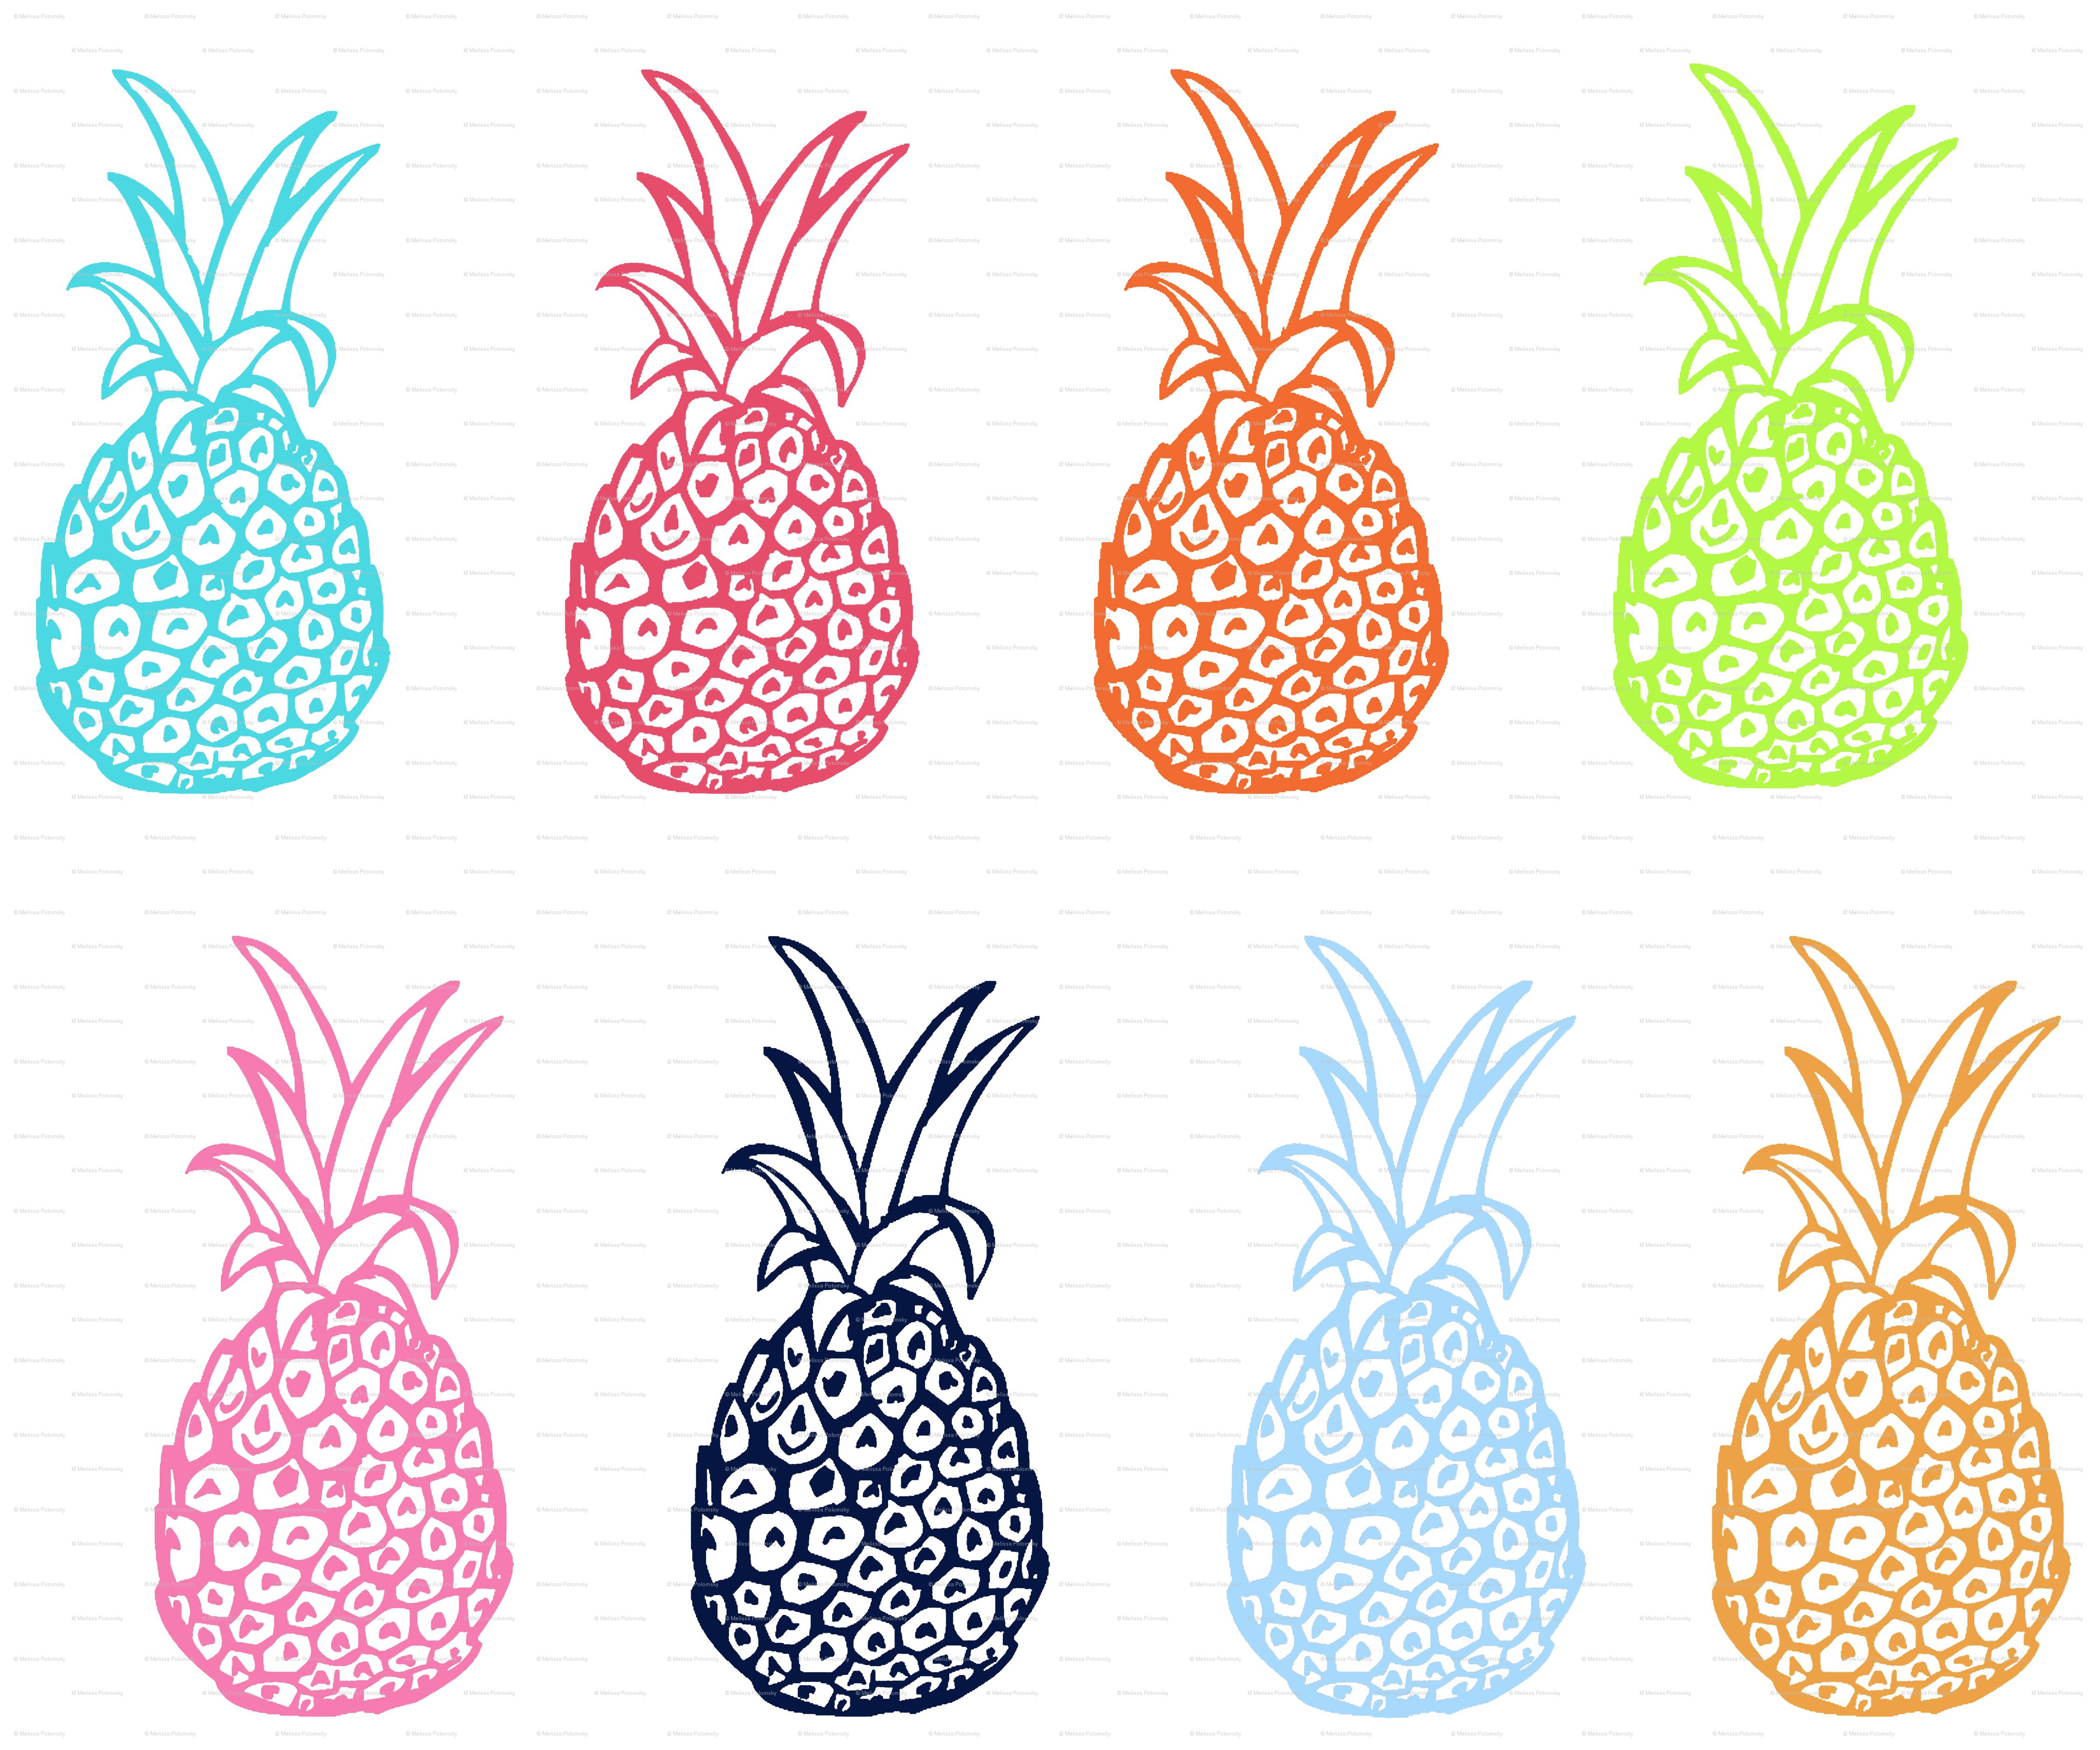 Pineapple Wallpaper Patterns Cute 4500x3750